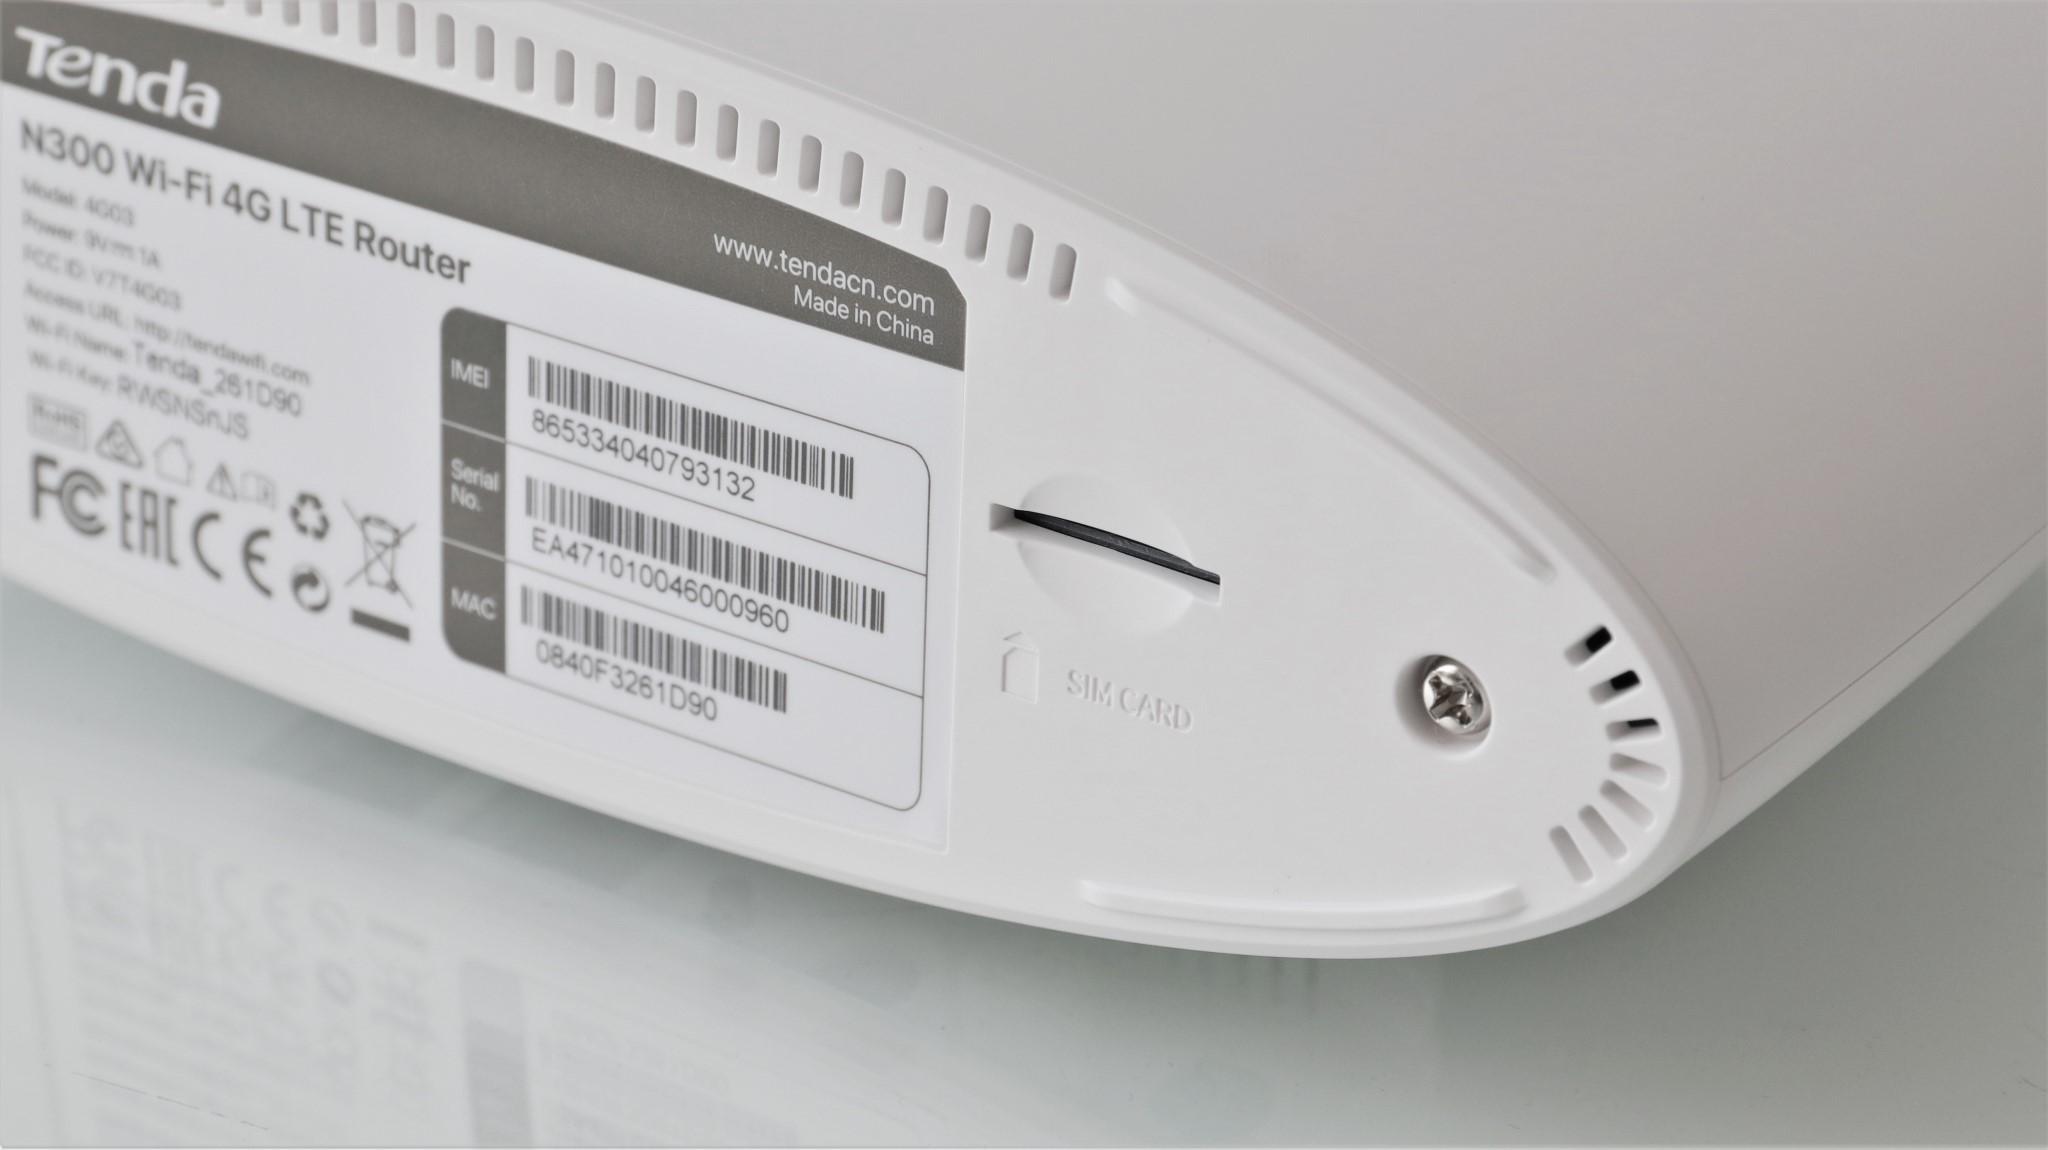 Router Wi-Fi 4G LTE Tenda 4G03